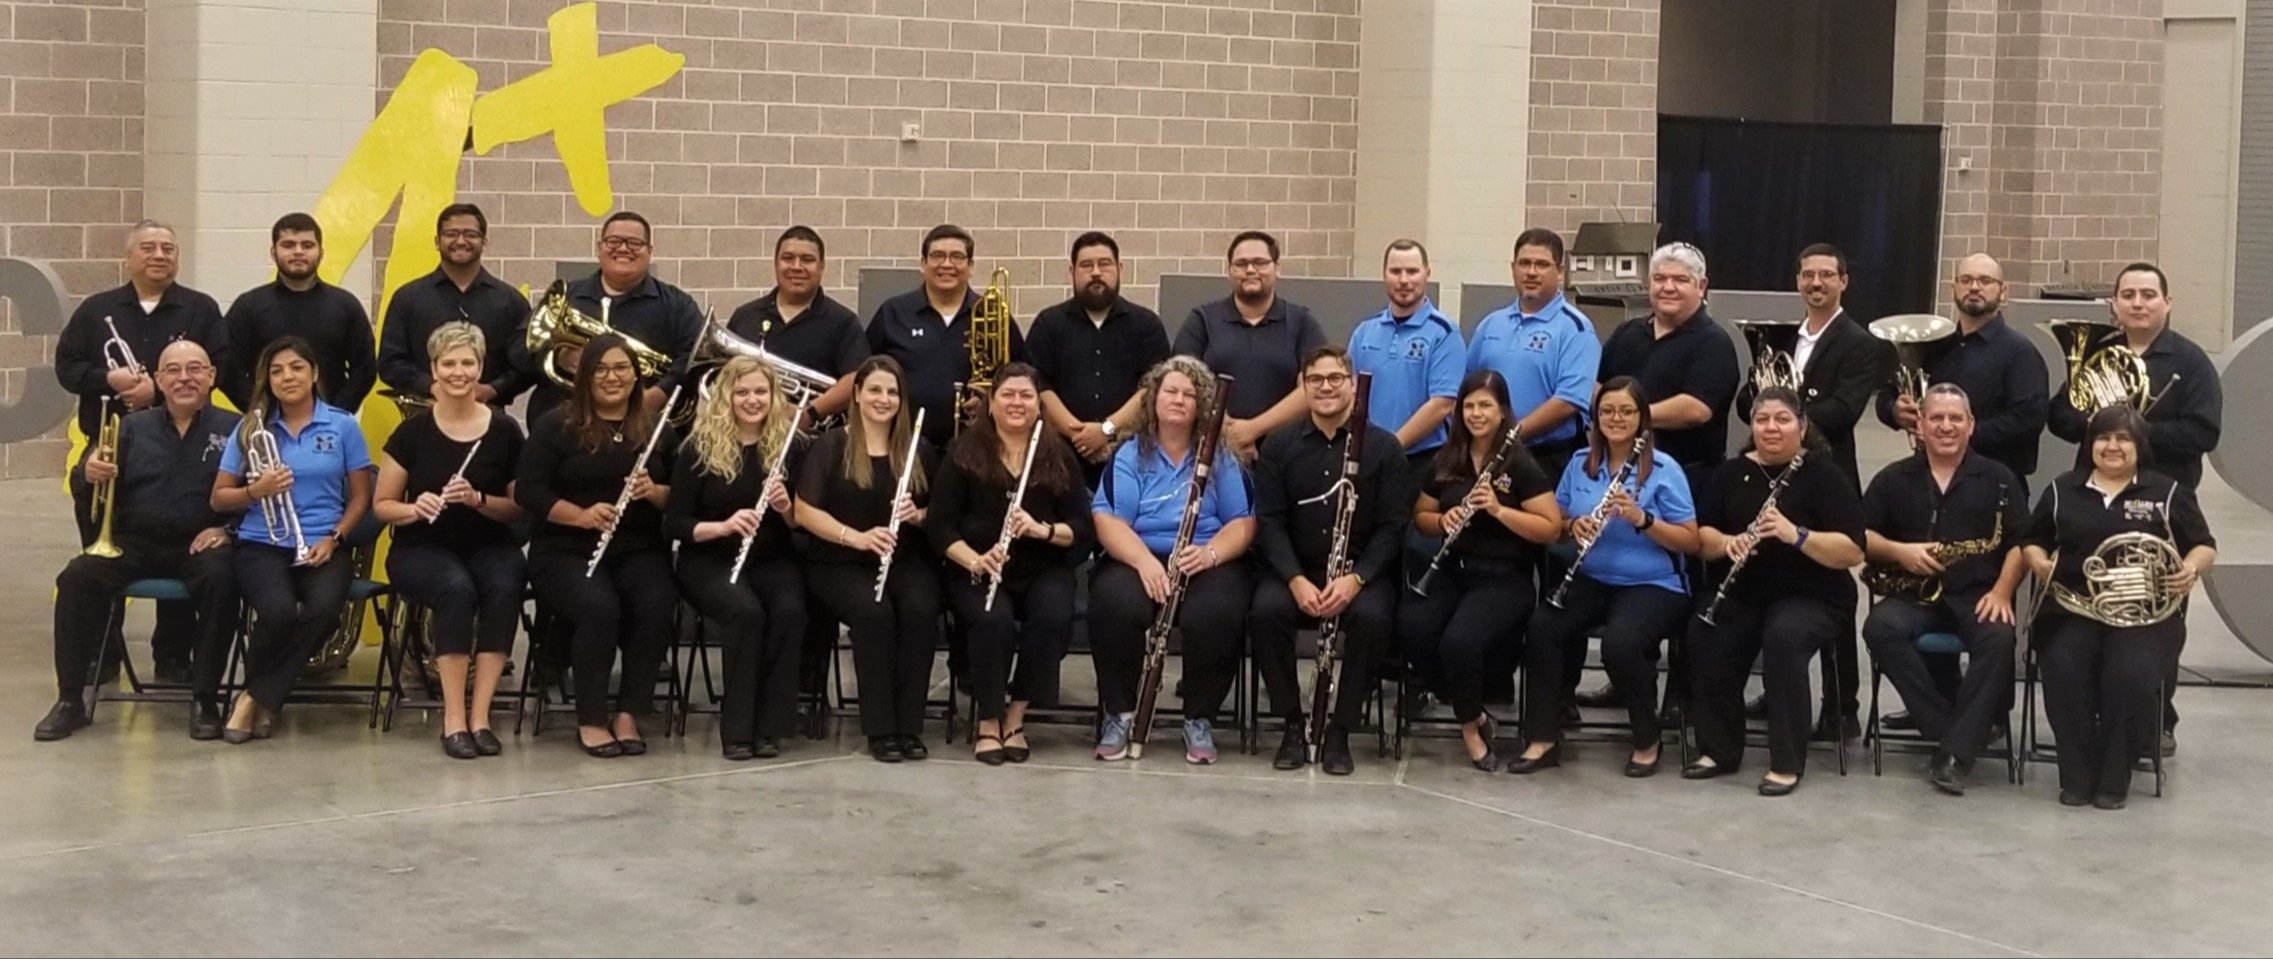 McAllen ISD Band Teaching Staff